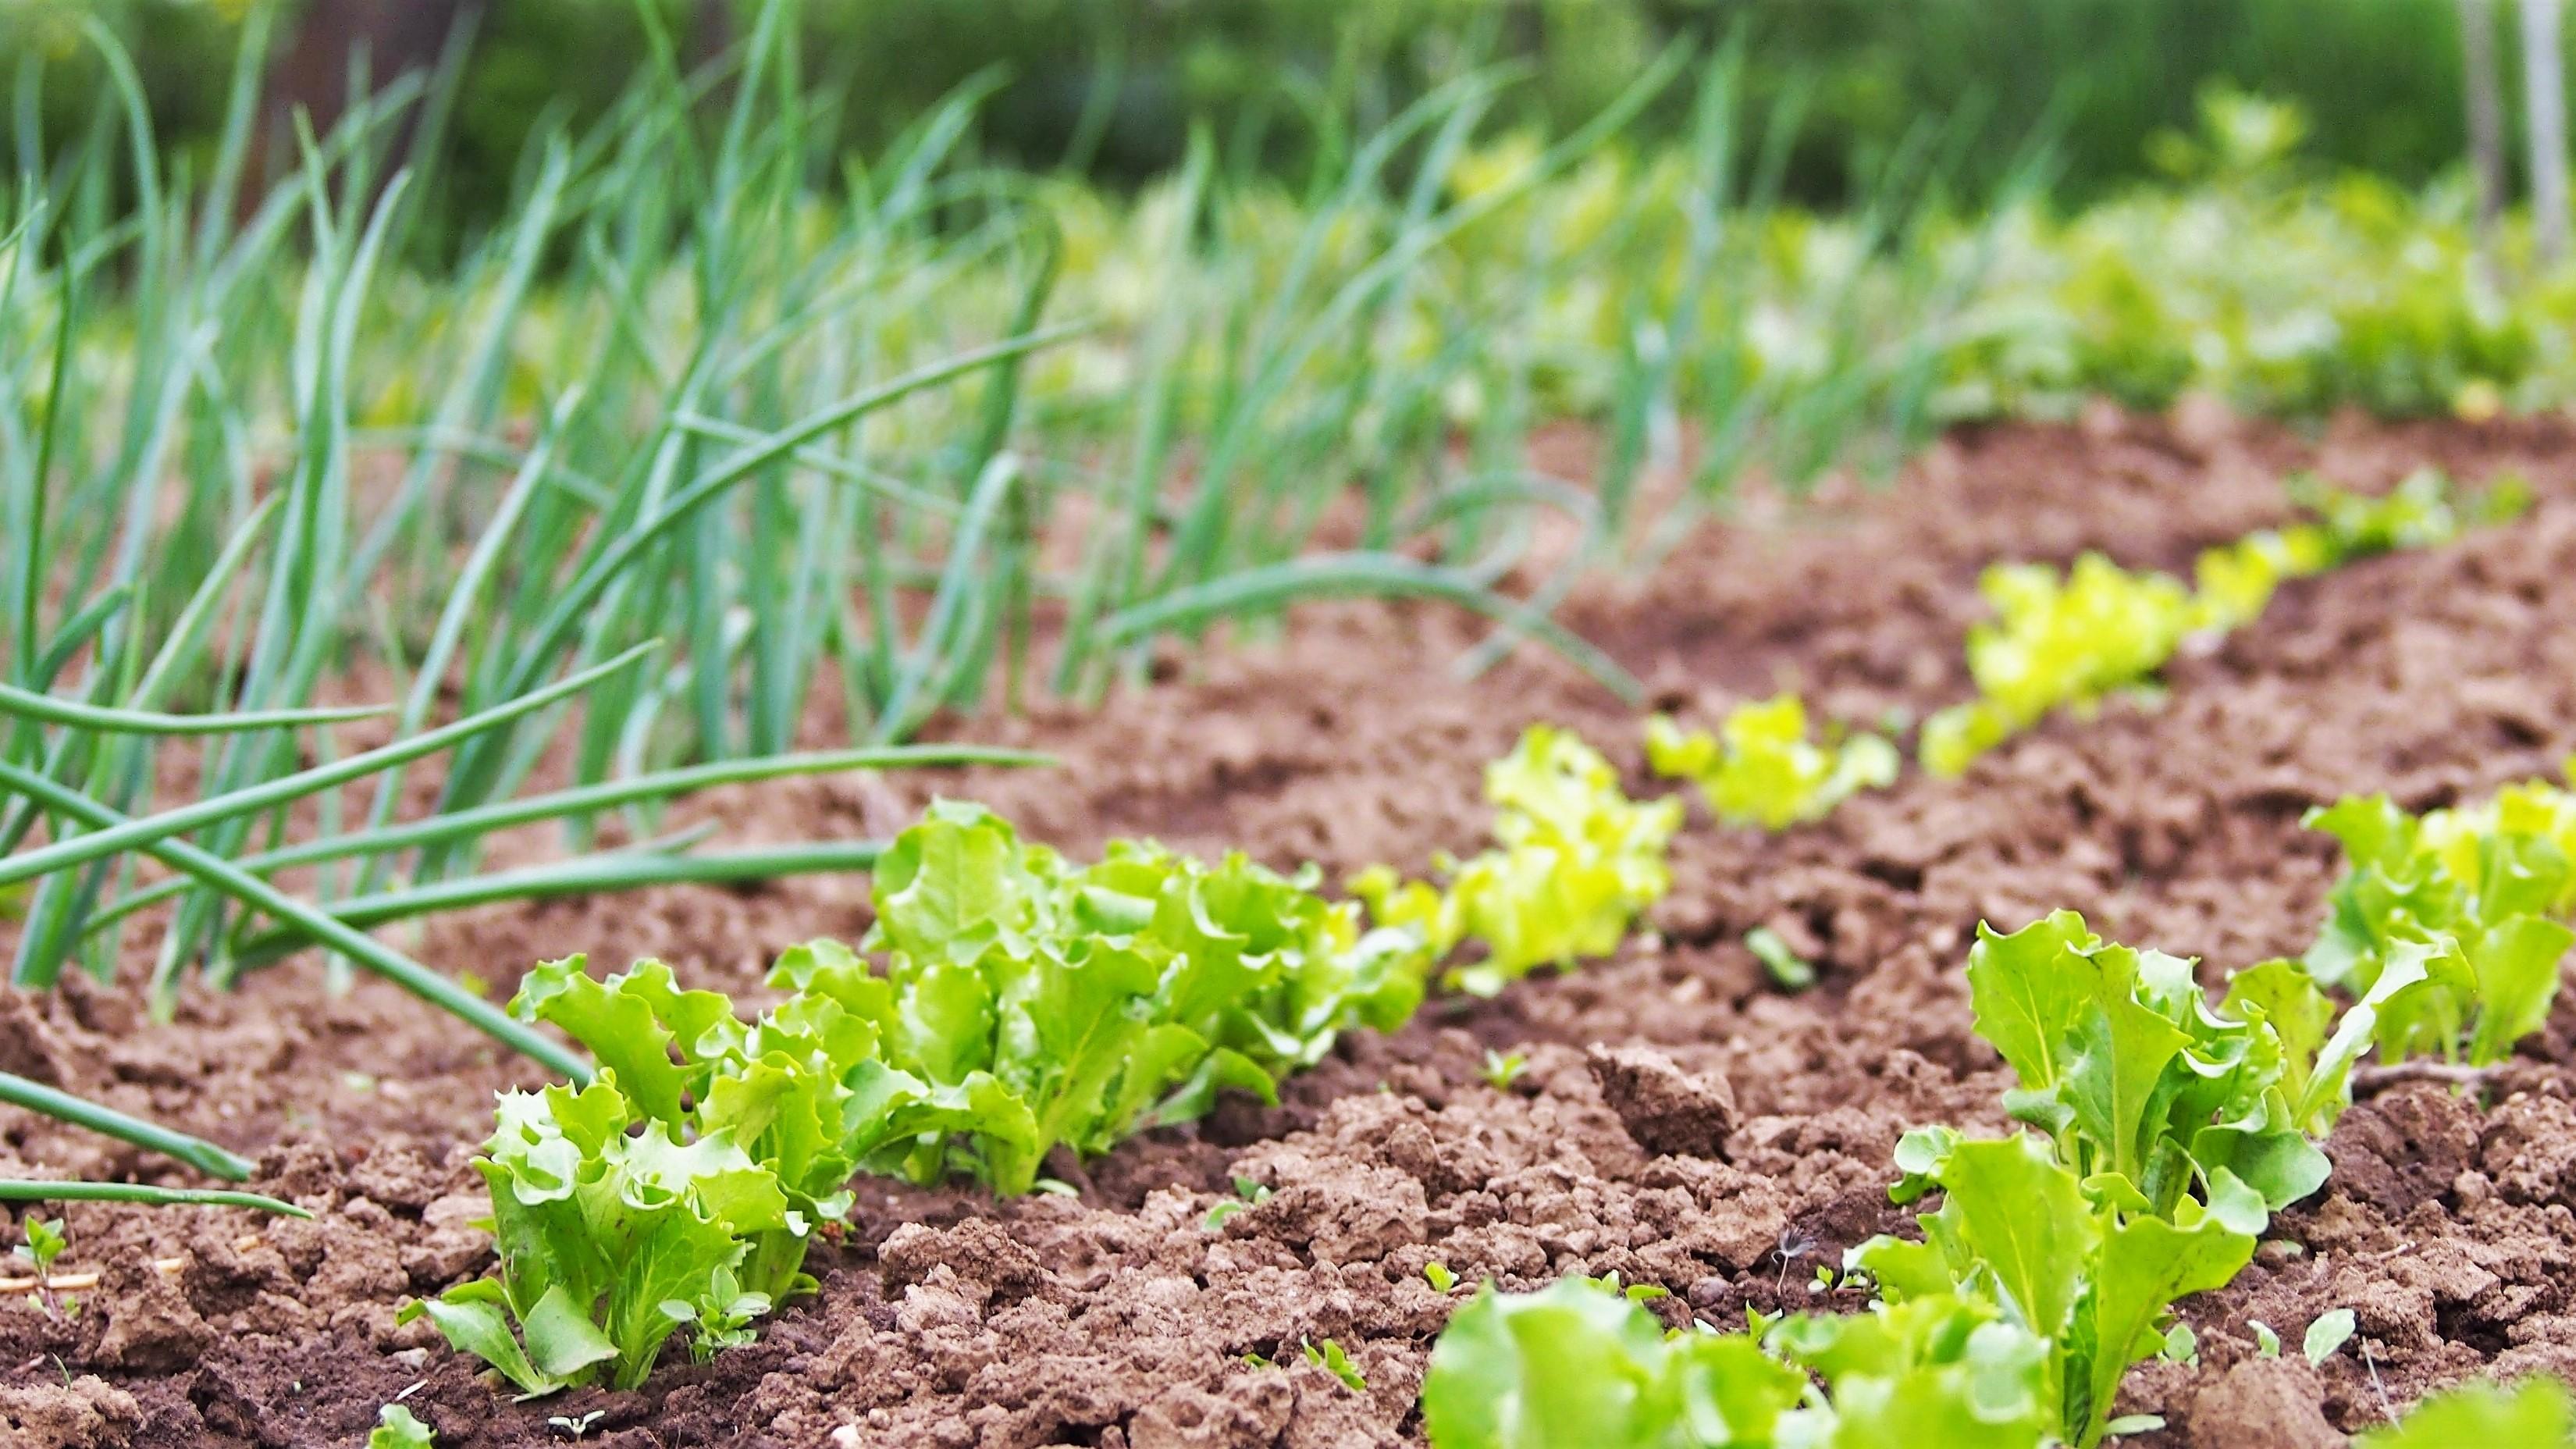 urban_inno_tuke_agriculture_16_9 (1)